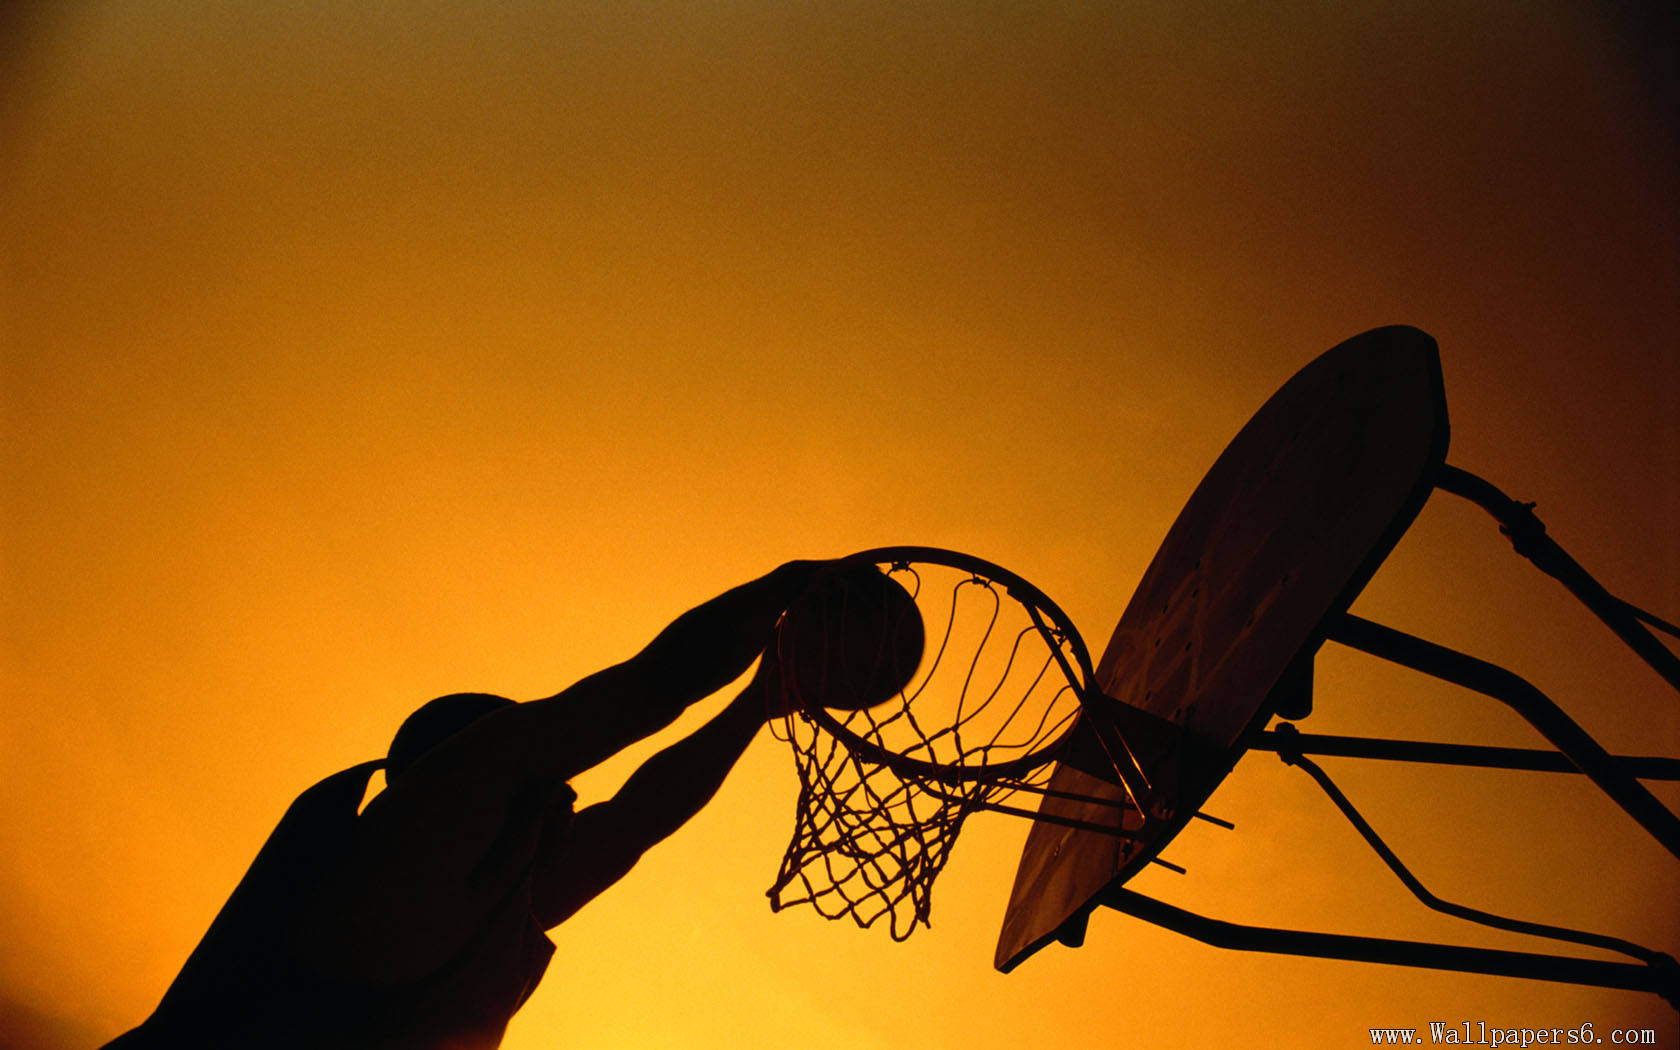 Cool Basketball Wallpapers for iPhone - WallpaperSafari